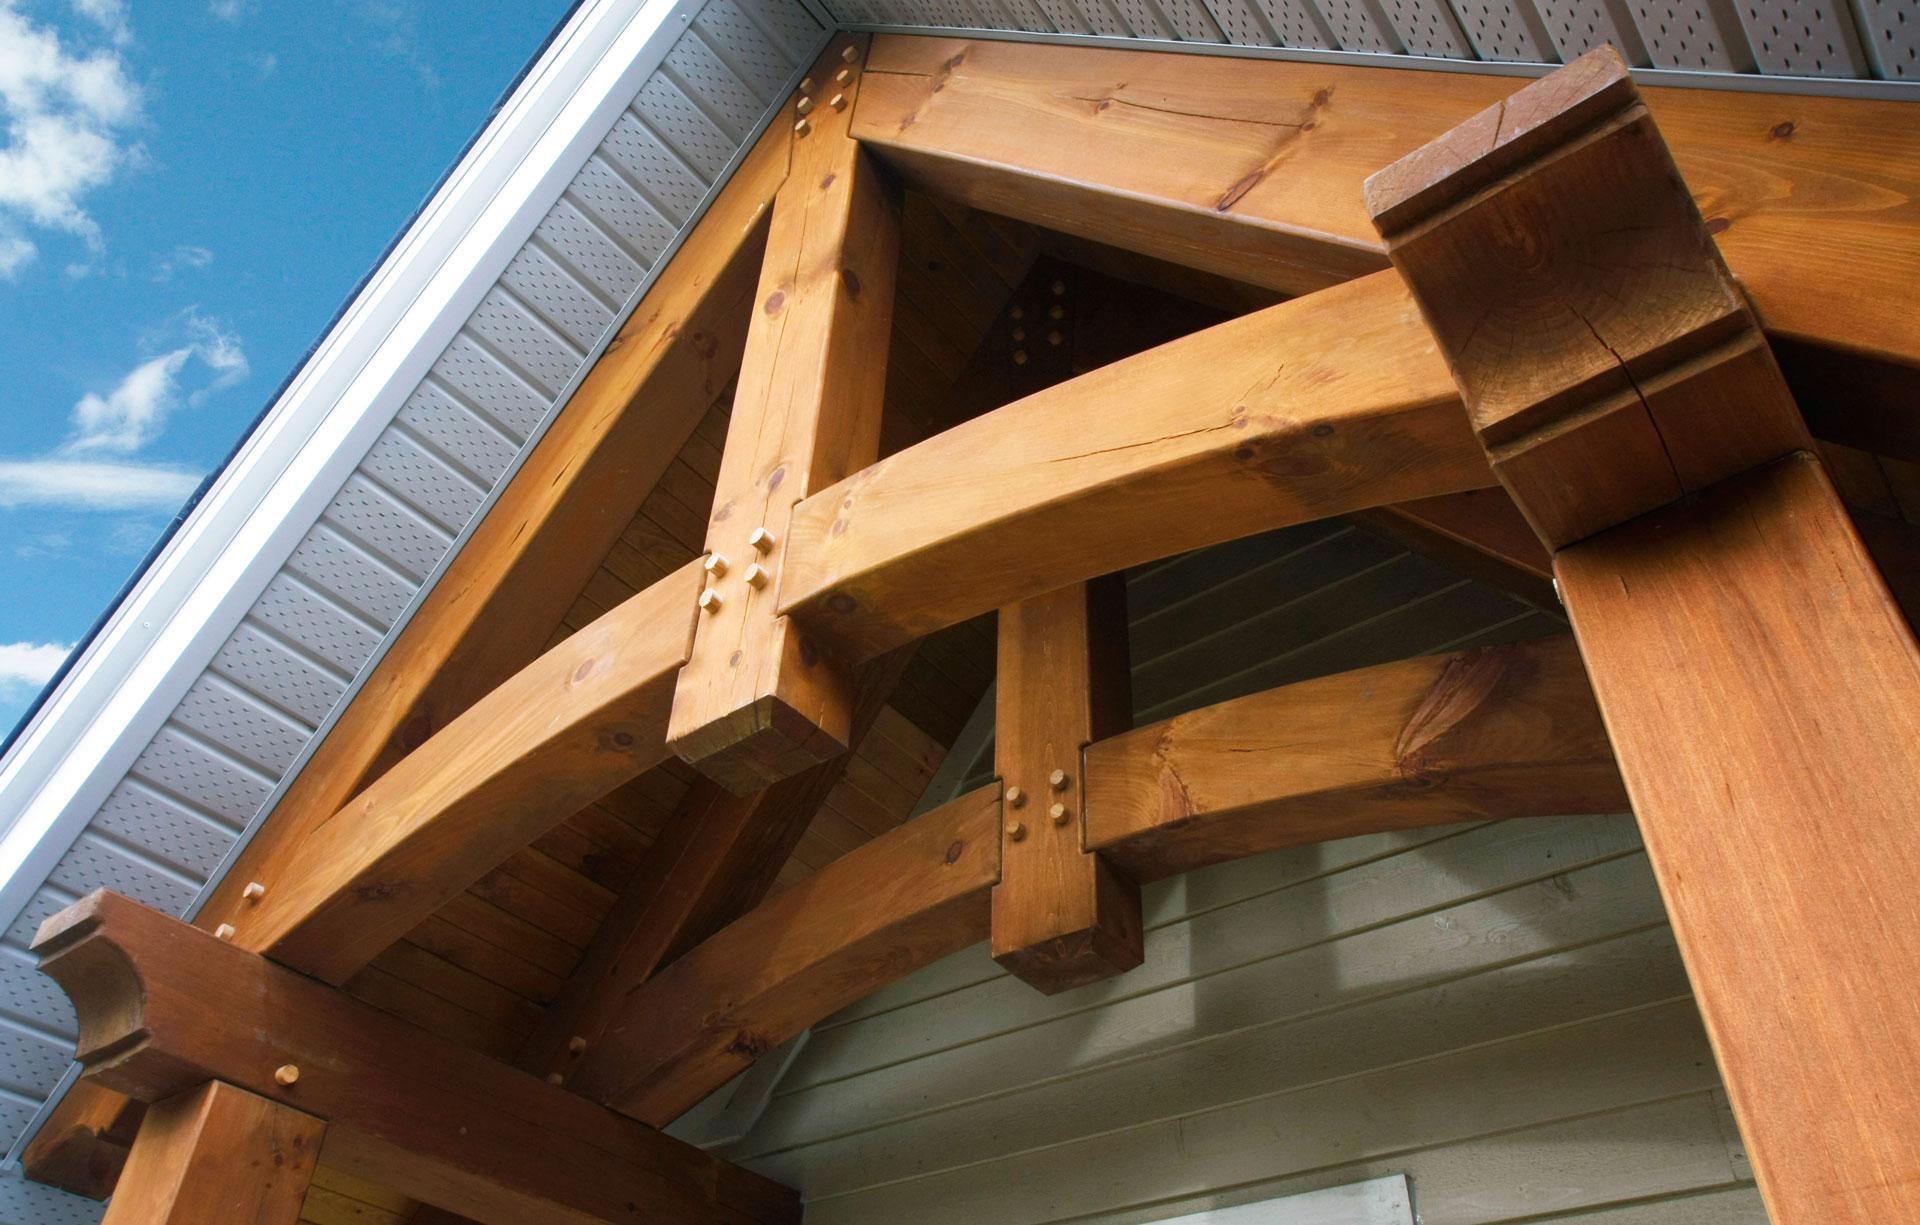 Structures de bois - Timberframe